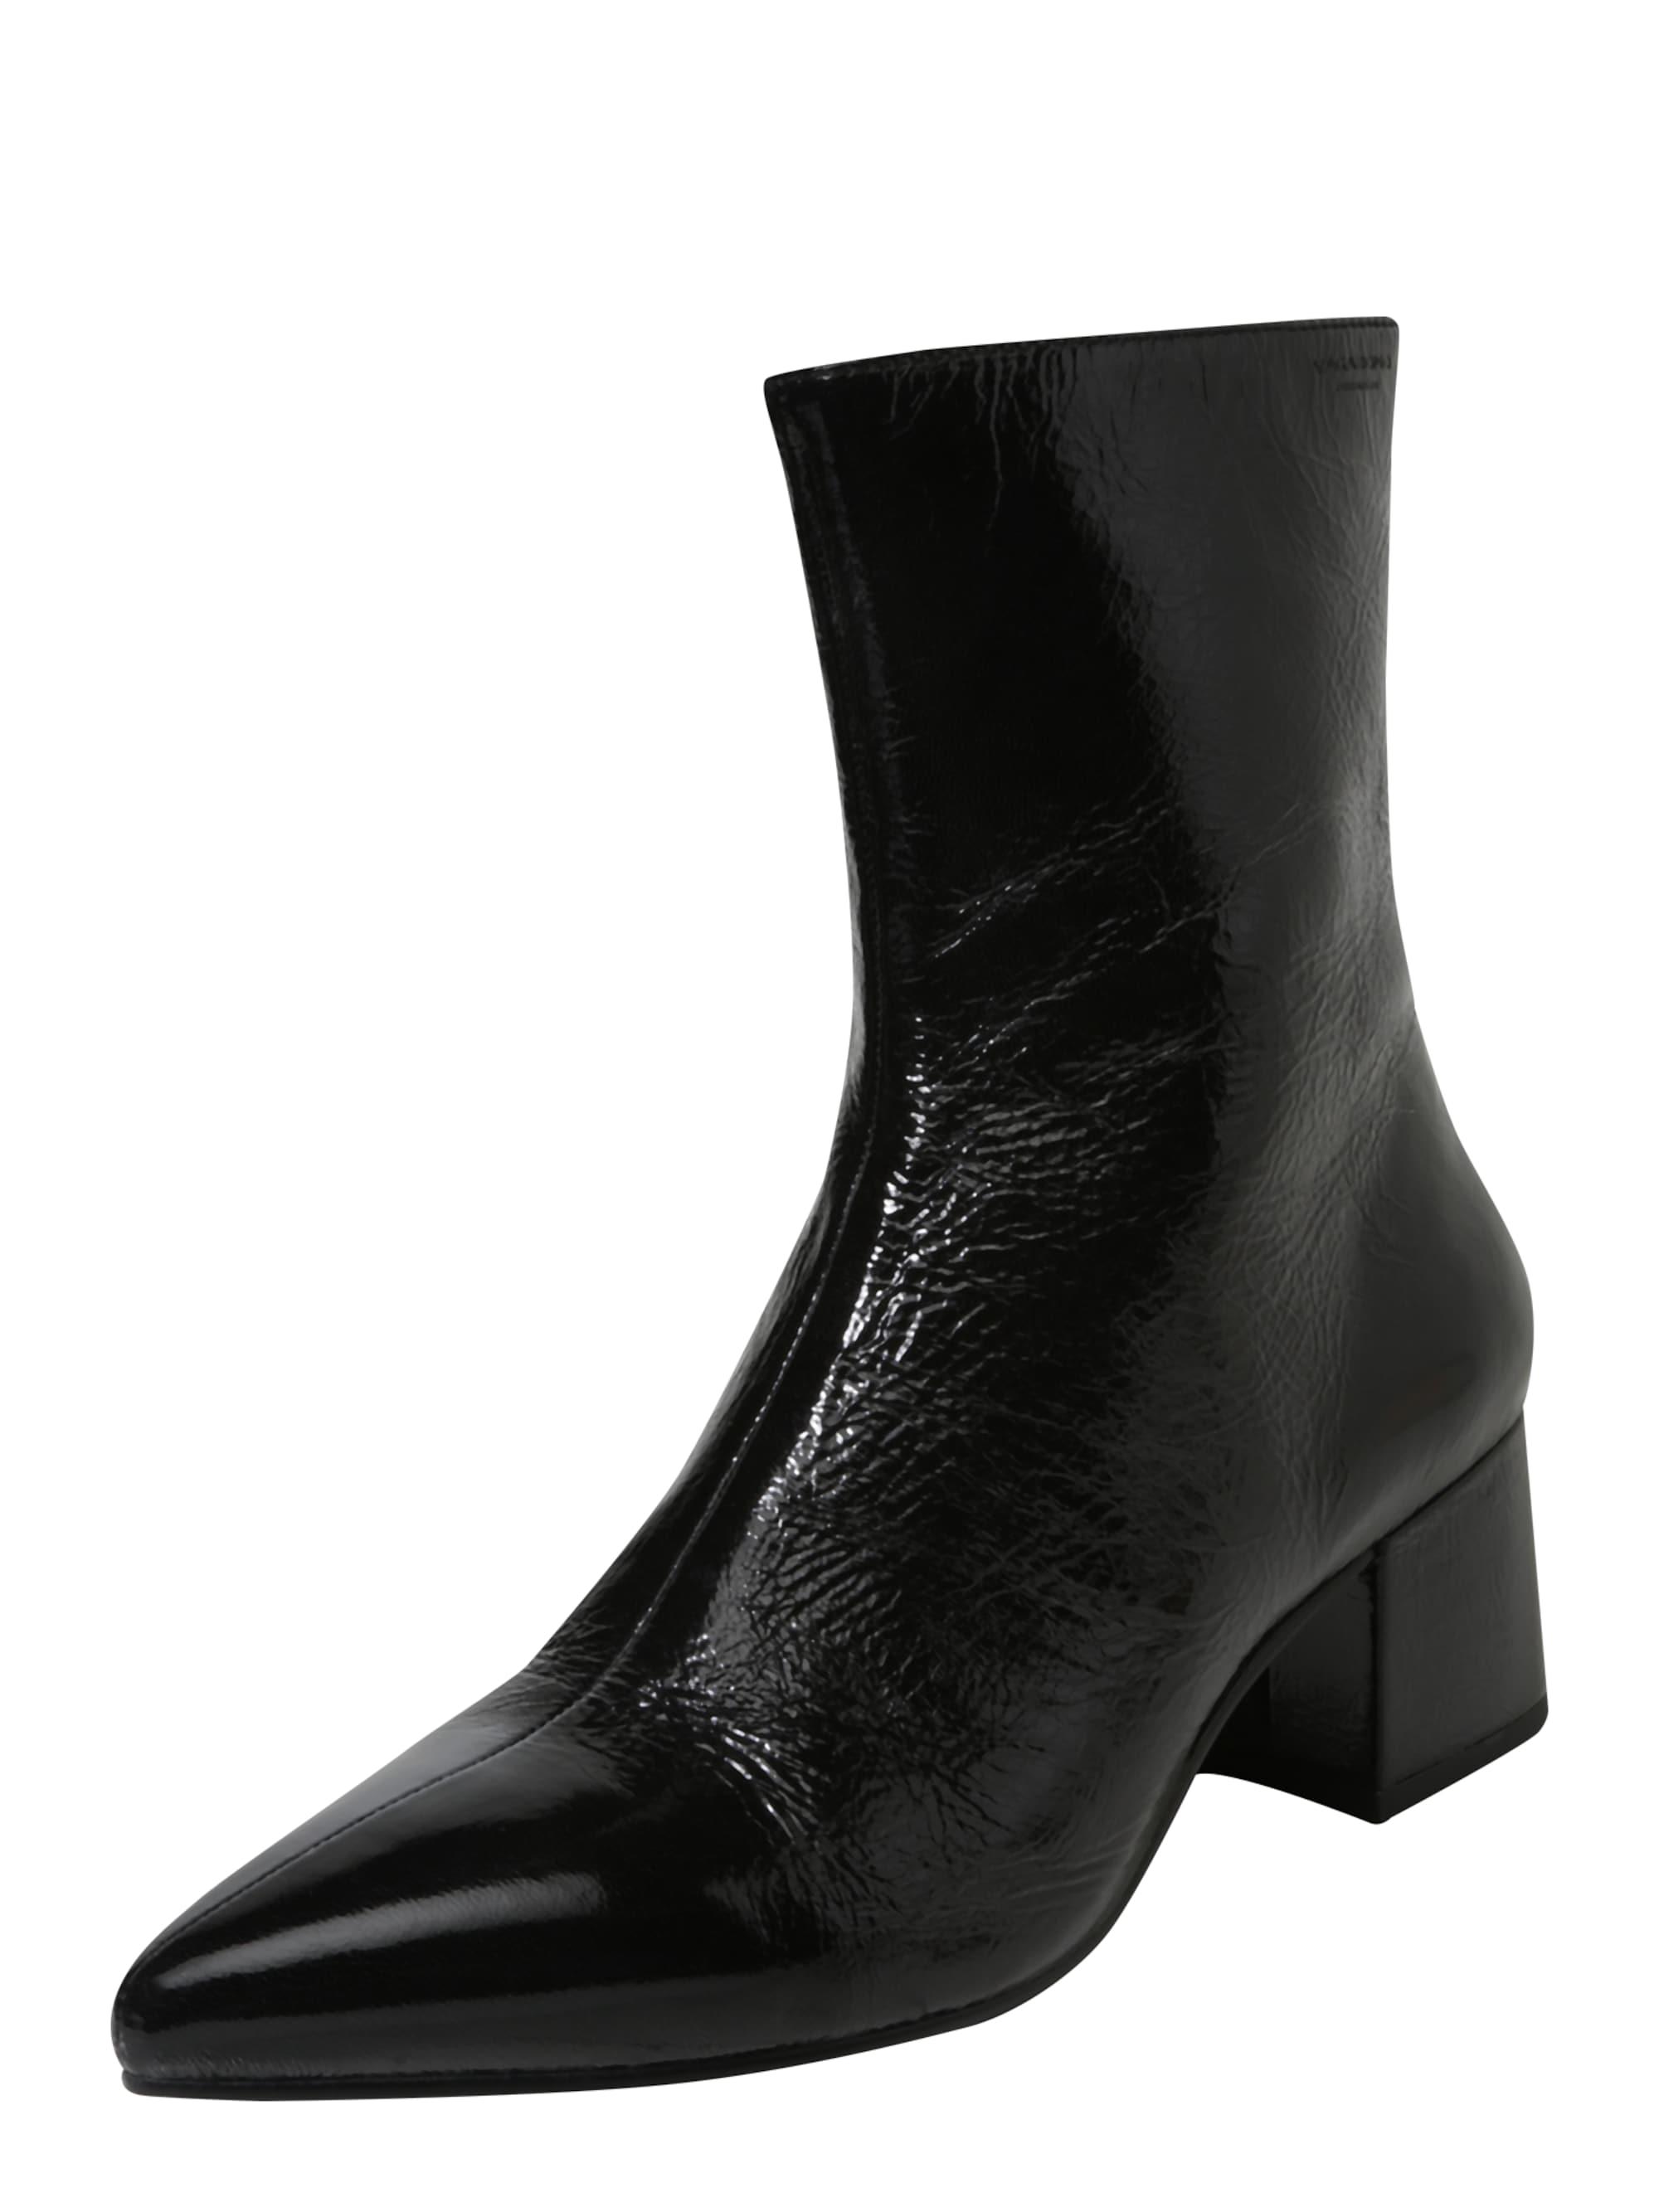 vagabond shoemakers - Boots ´Mya´